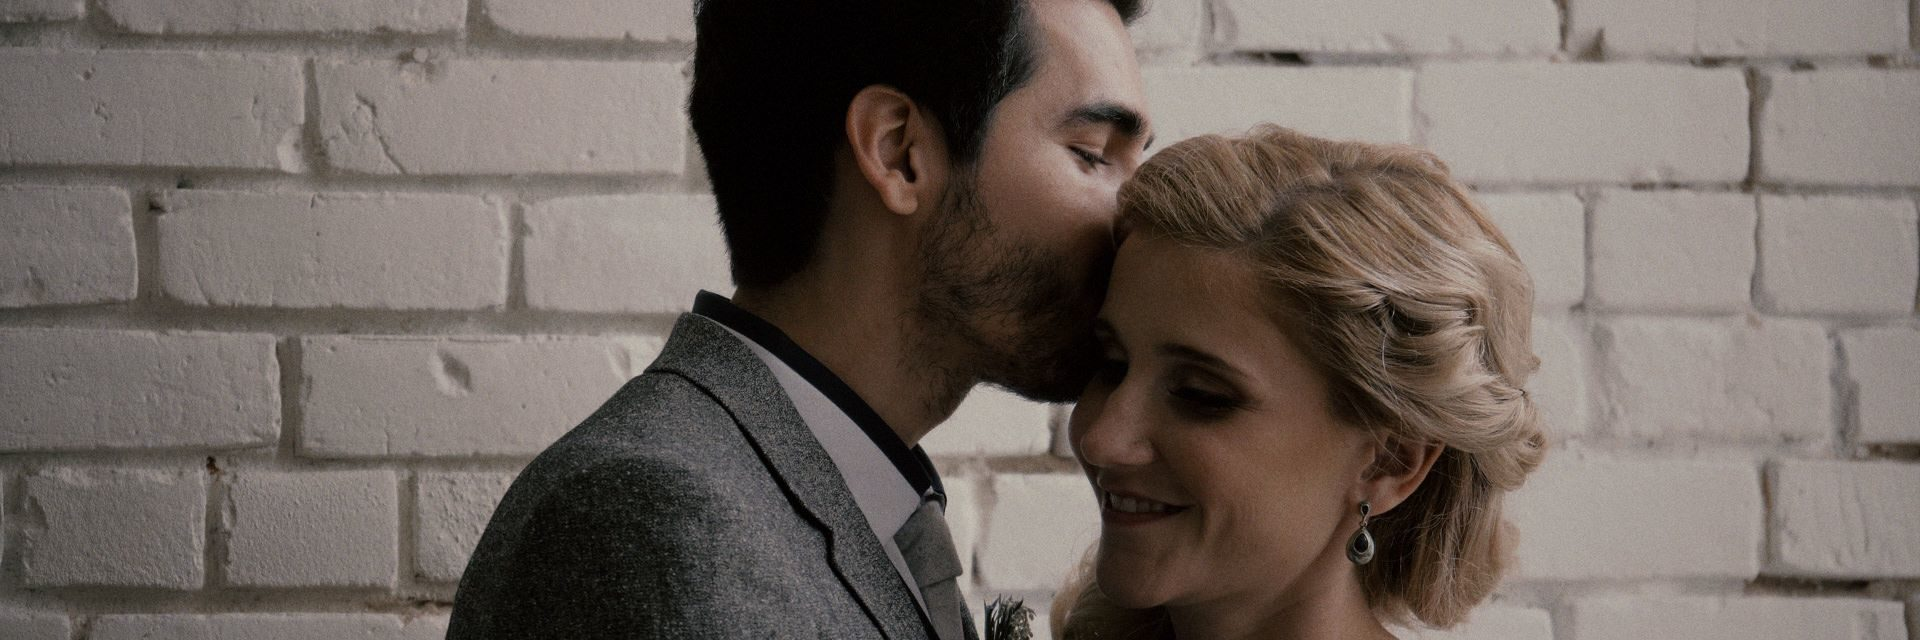 Perugia-wedding-videographer-cinemate-films-03